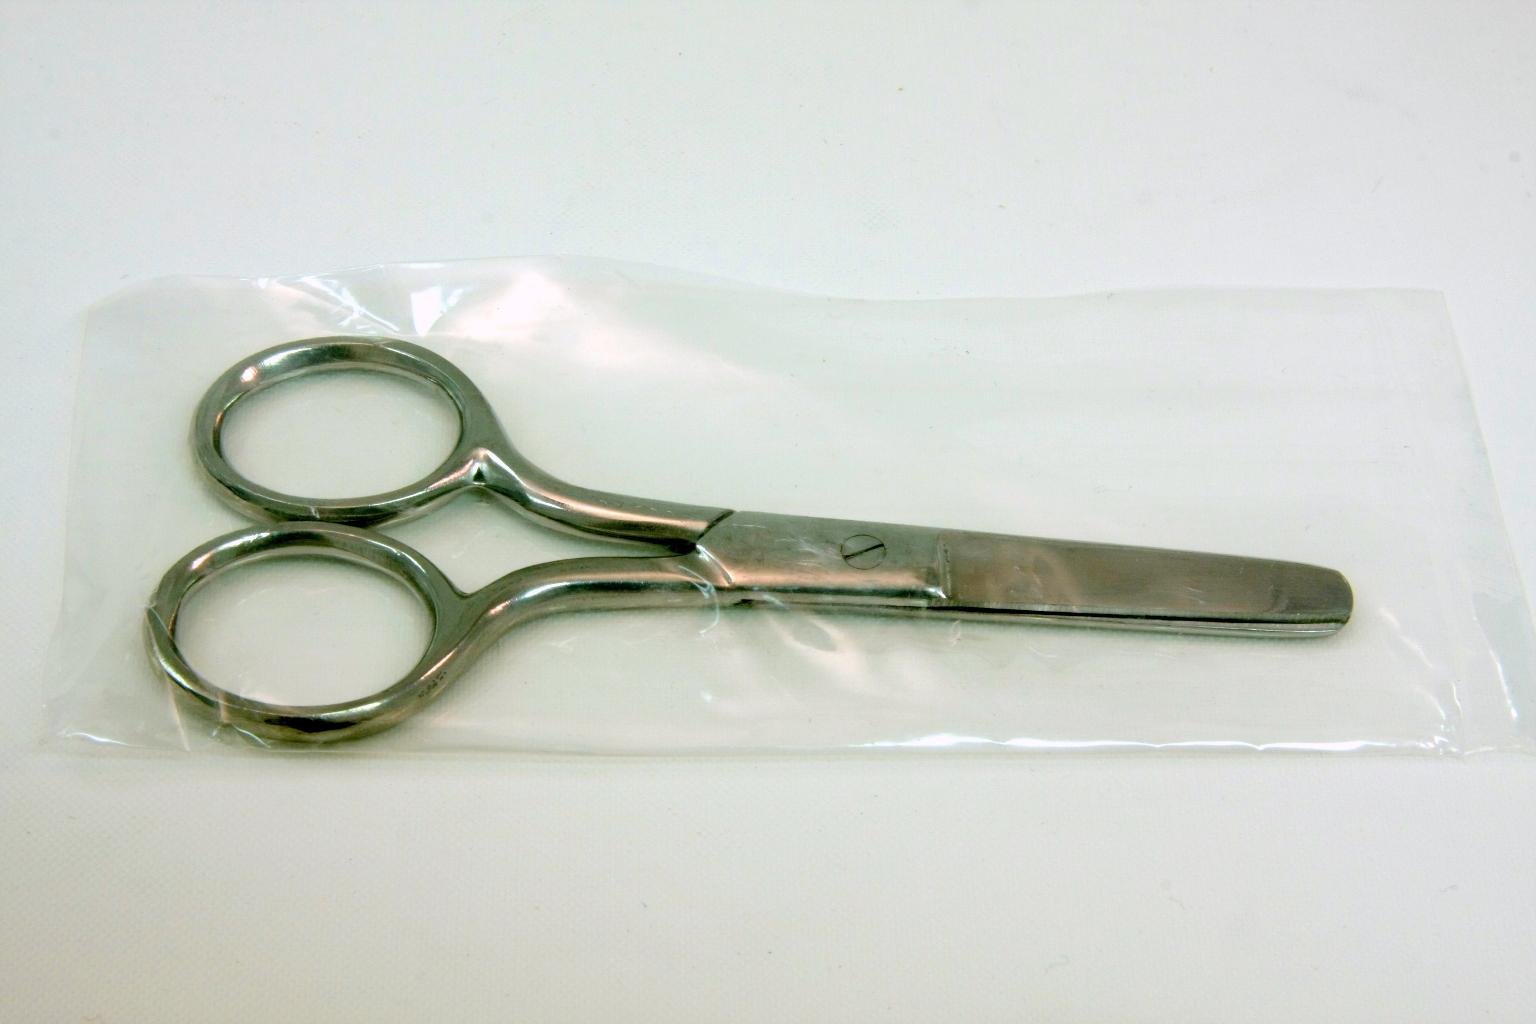 "Wholesale Scissors 4"" round tip (SKU 2304582) DollarDays"